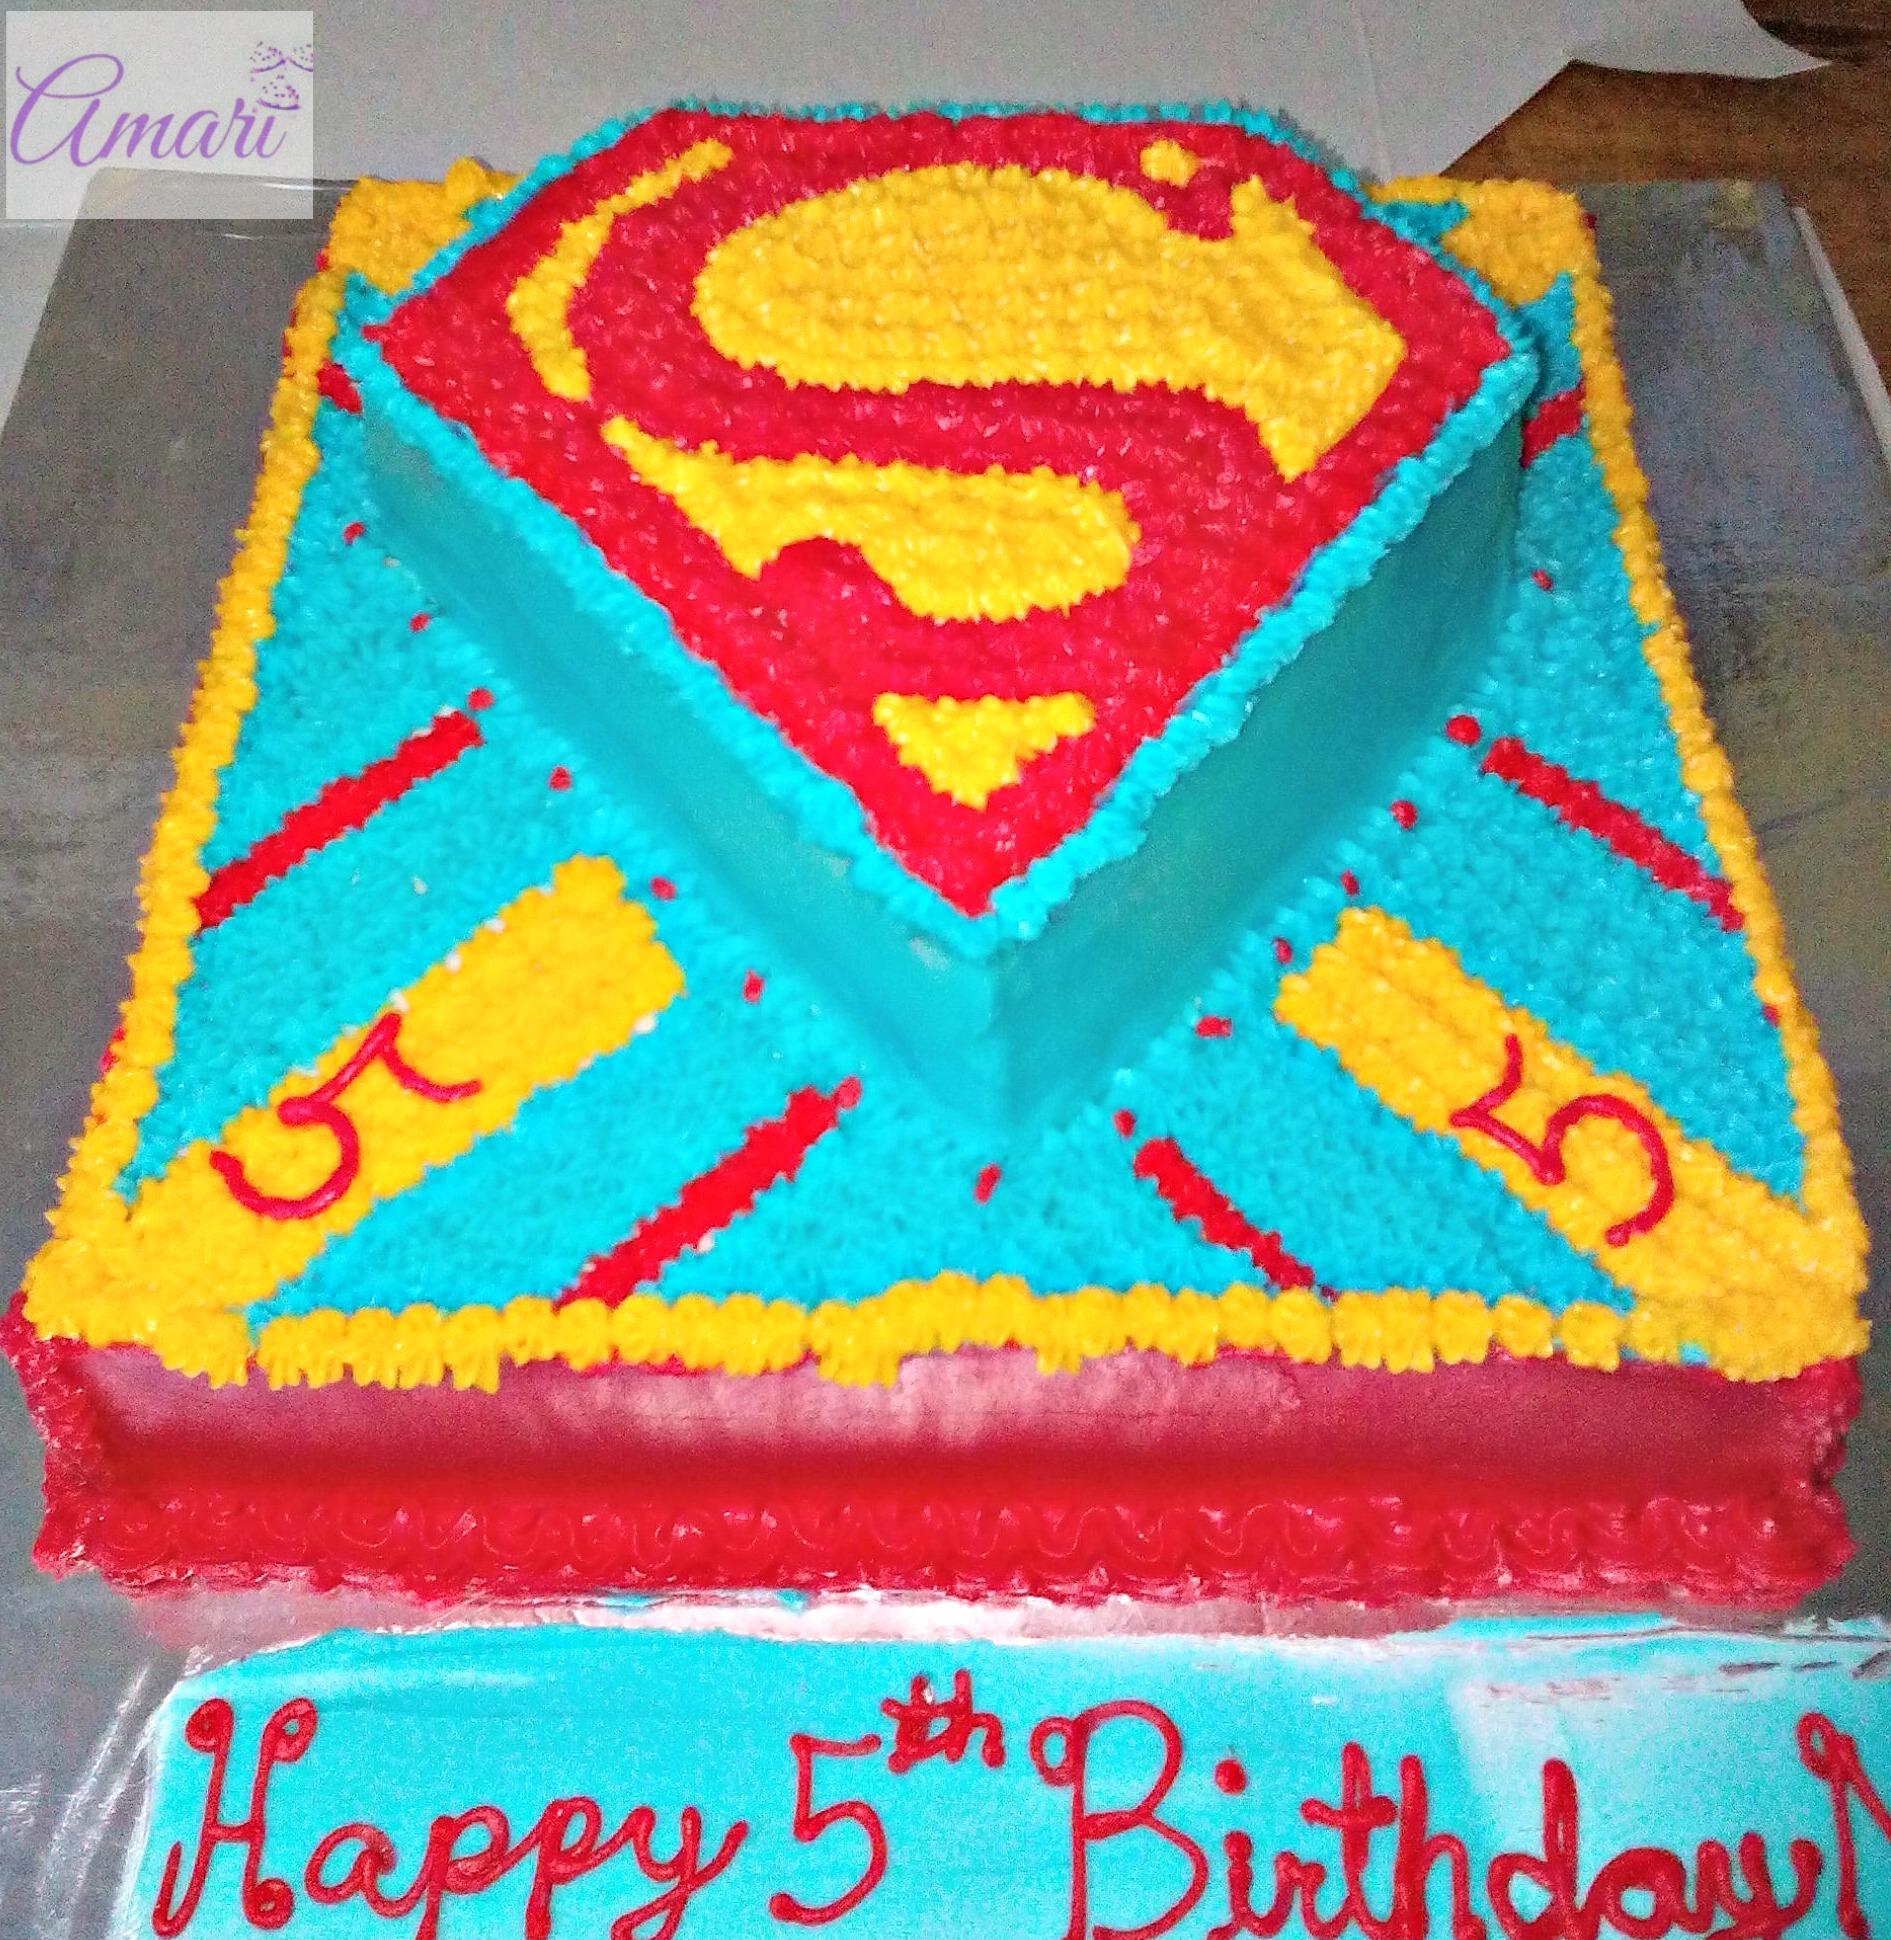 Cake Decoration Tutorials Amari Baking Center